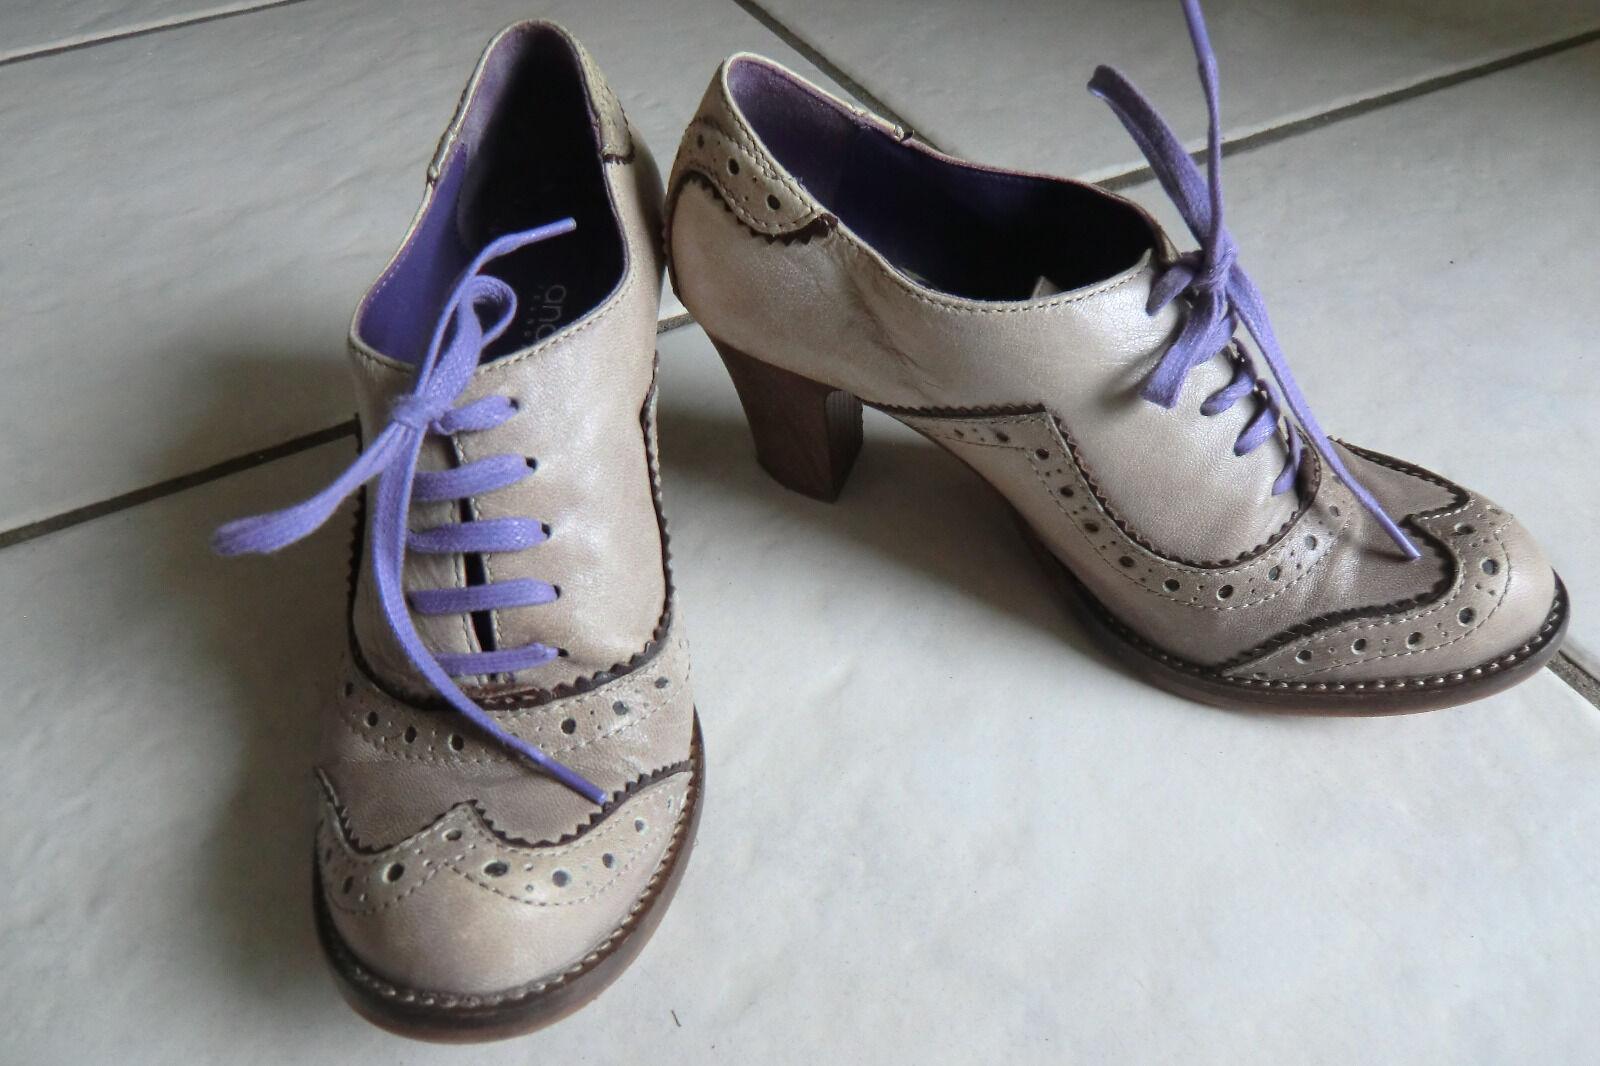 Ausgefallene Andiamo Schuhe Gr. 37 Grau/Lila - Neu - NP 169.-